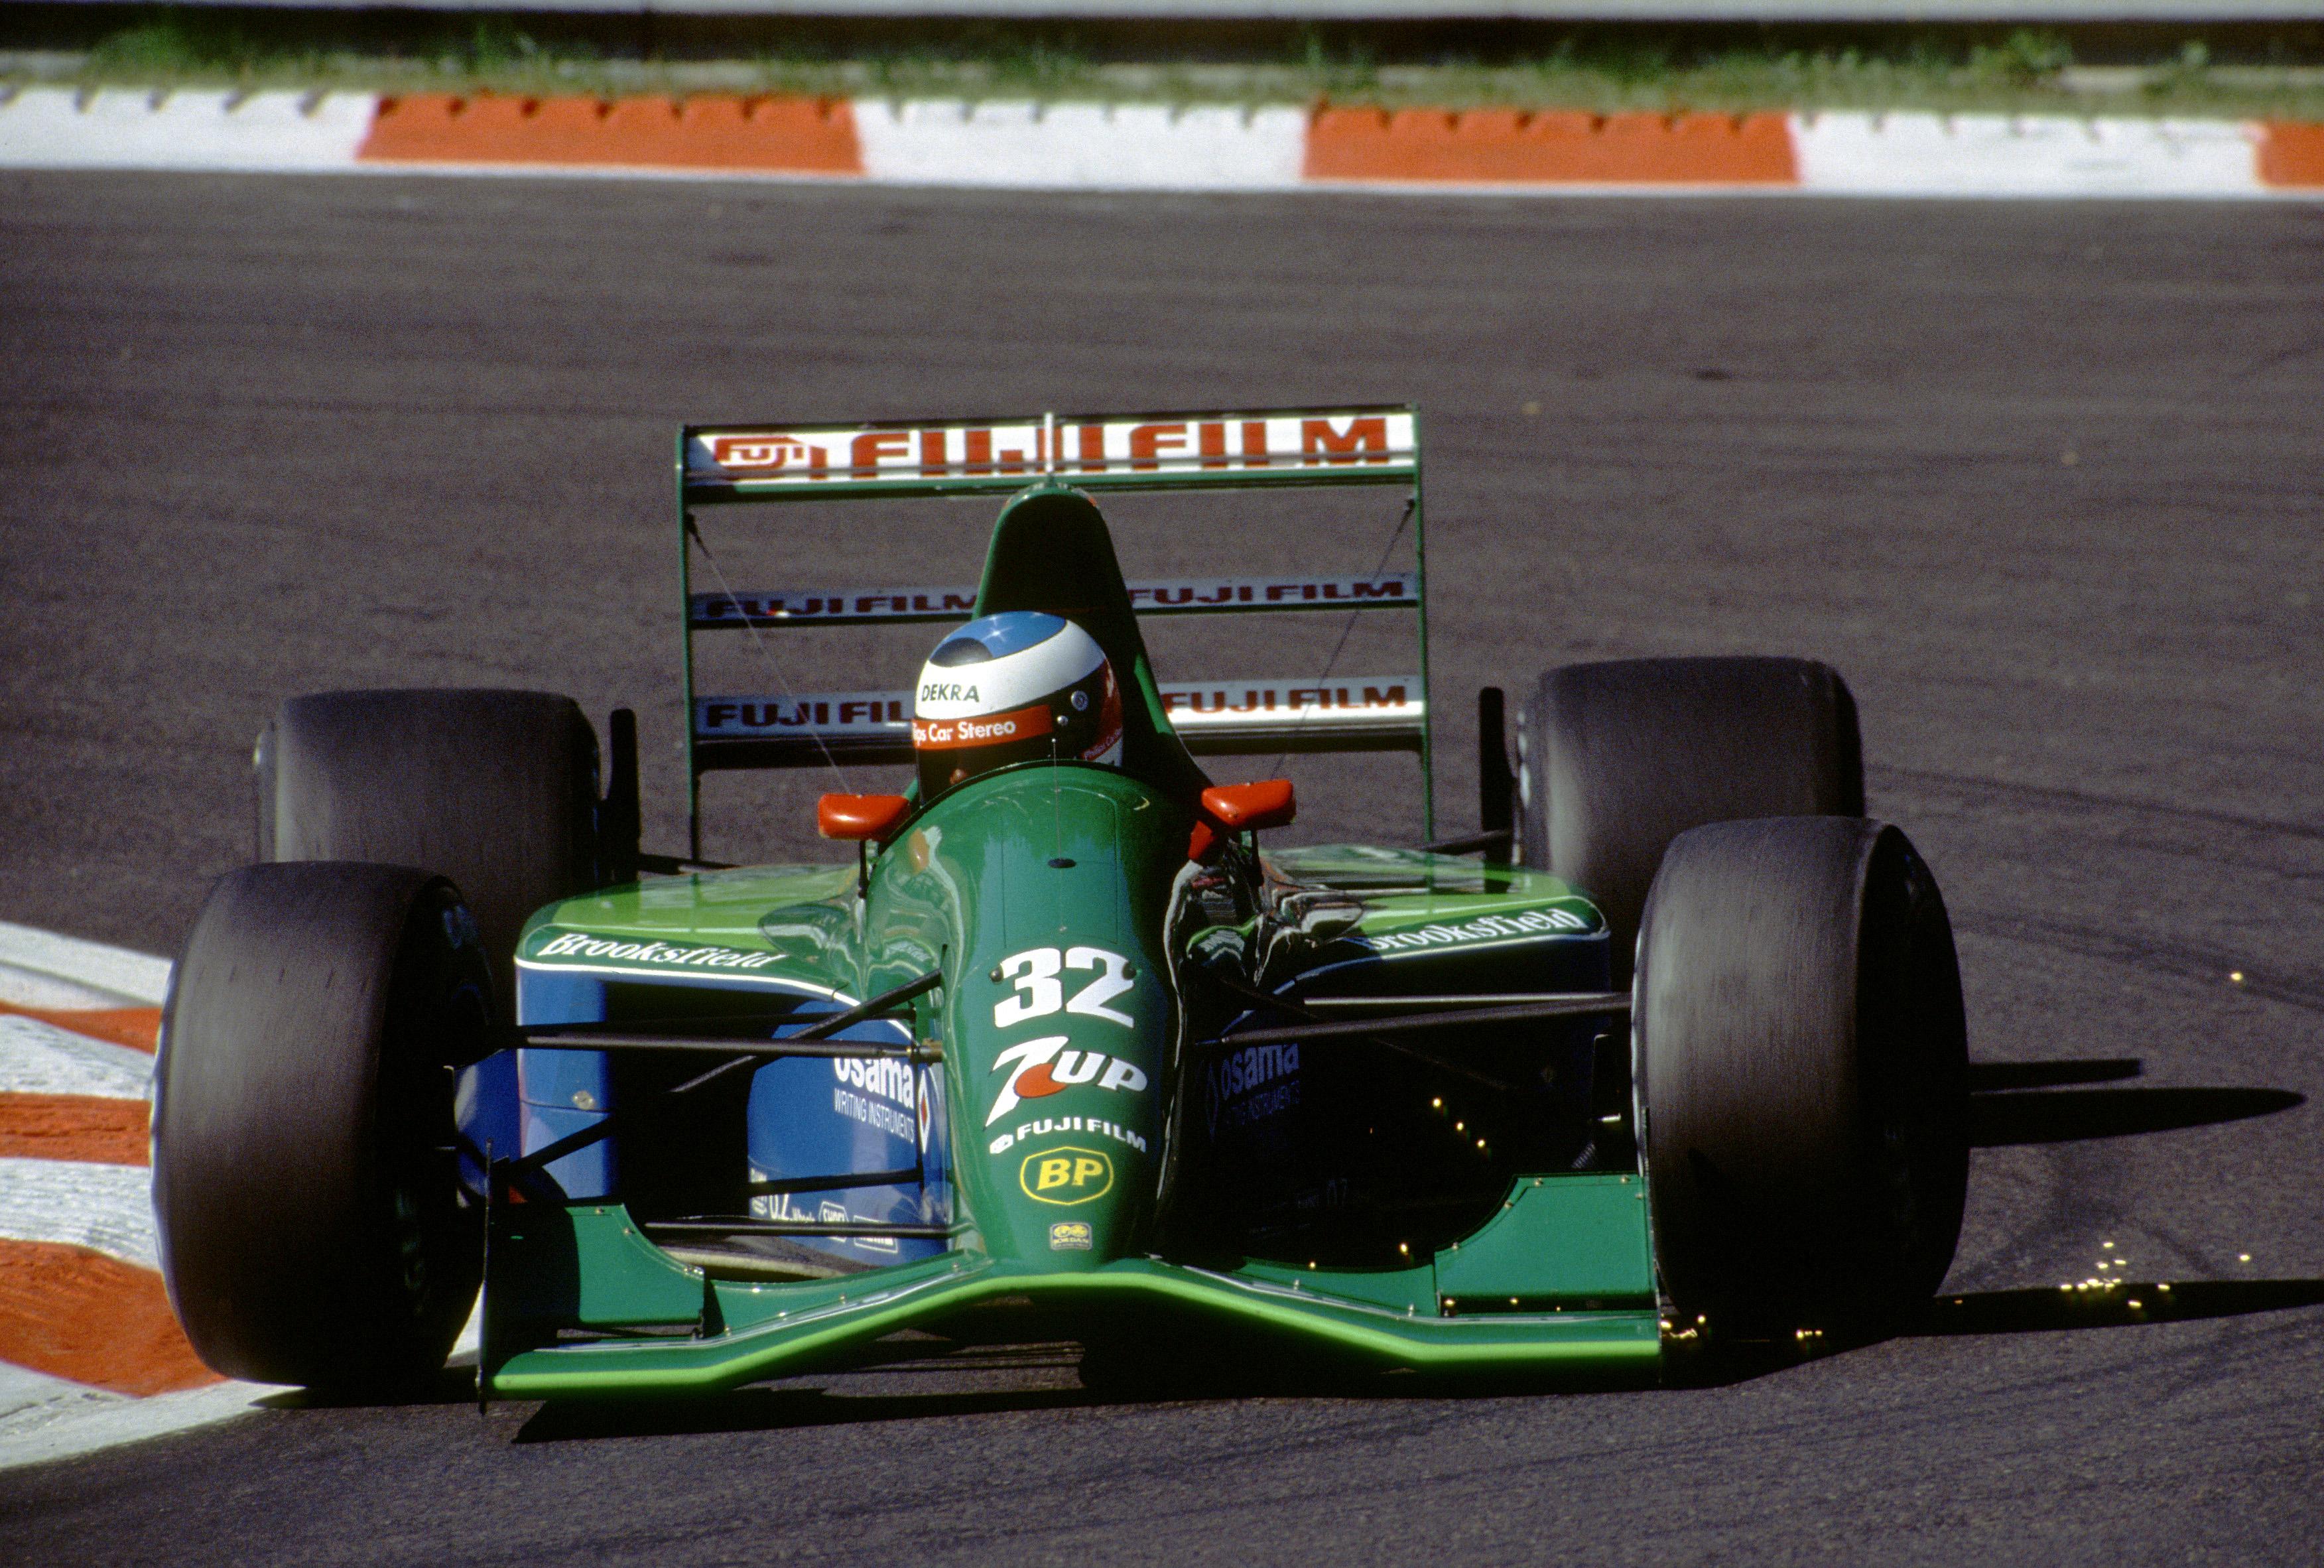 Belgian Grand Prix Spa Francorchamps (bel) 23 25 08 1991